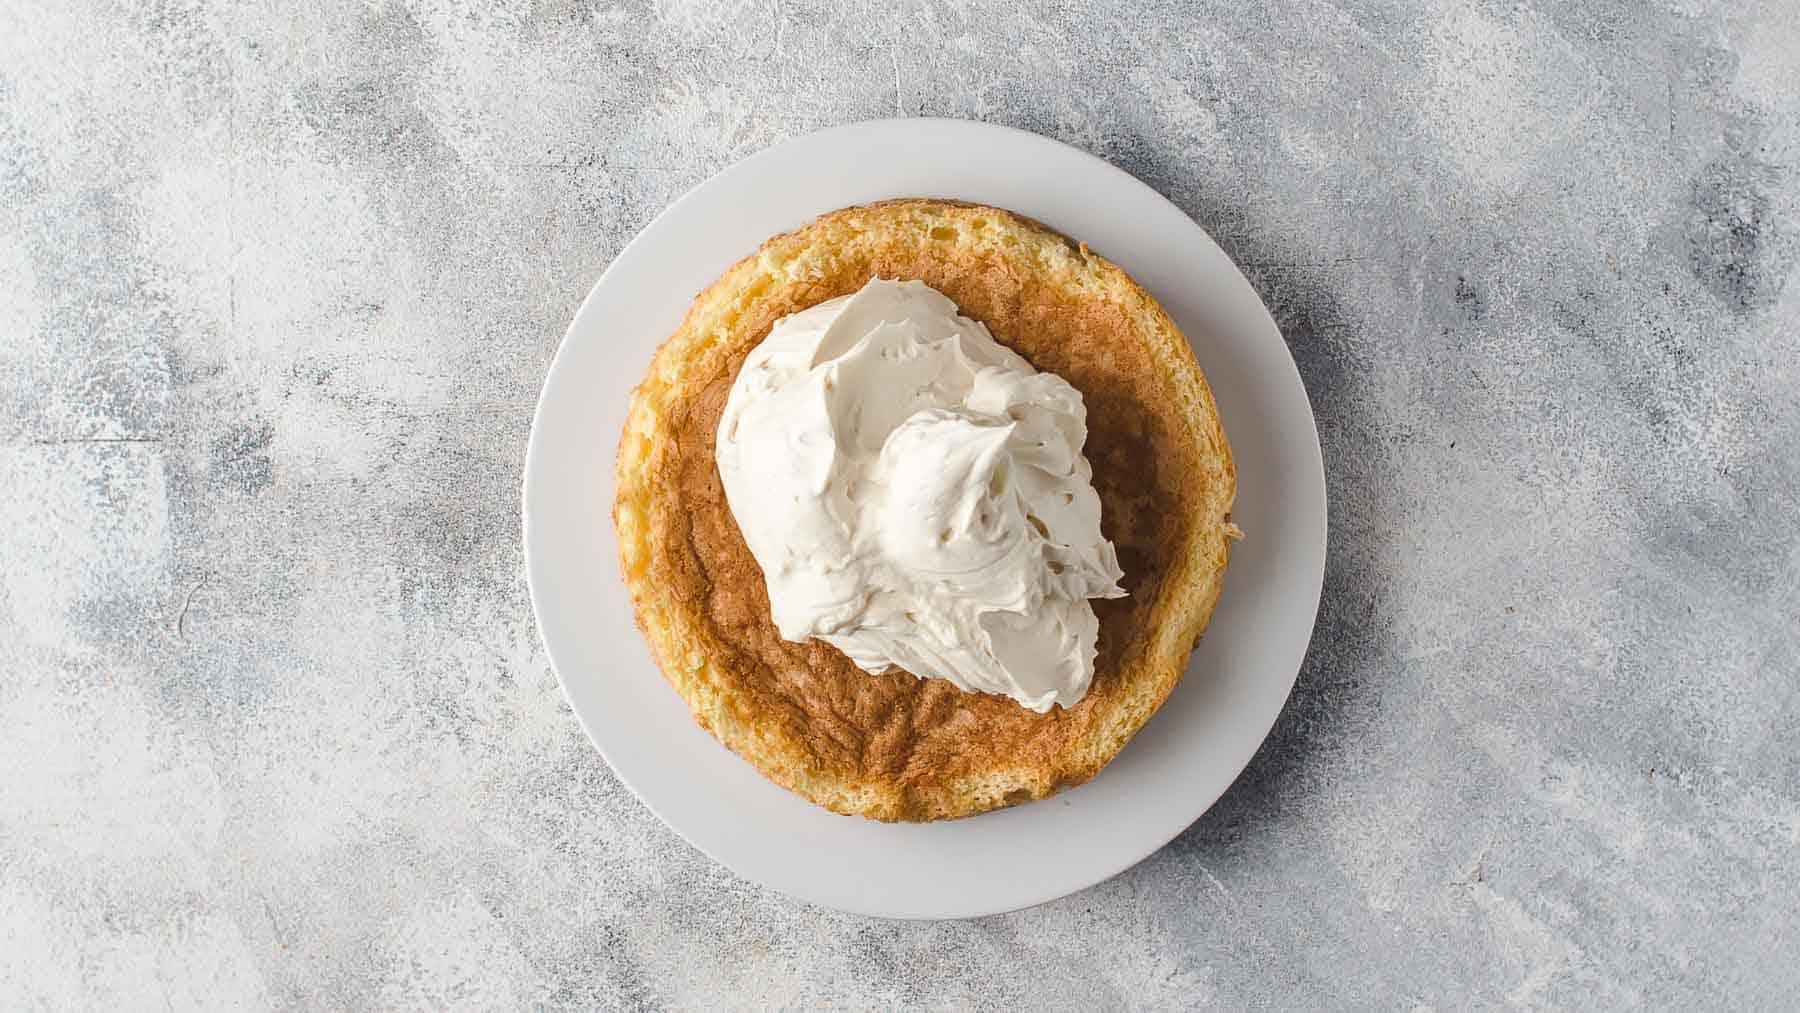 Mascarpone cream on top of first cake layer